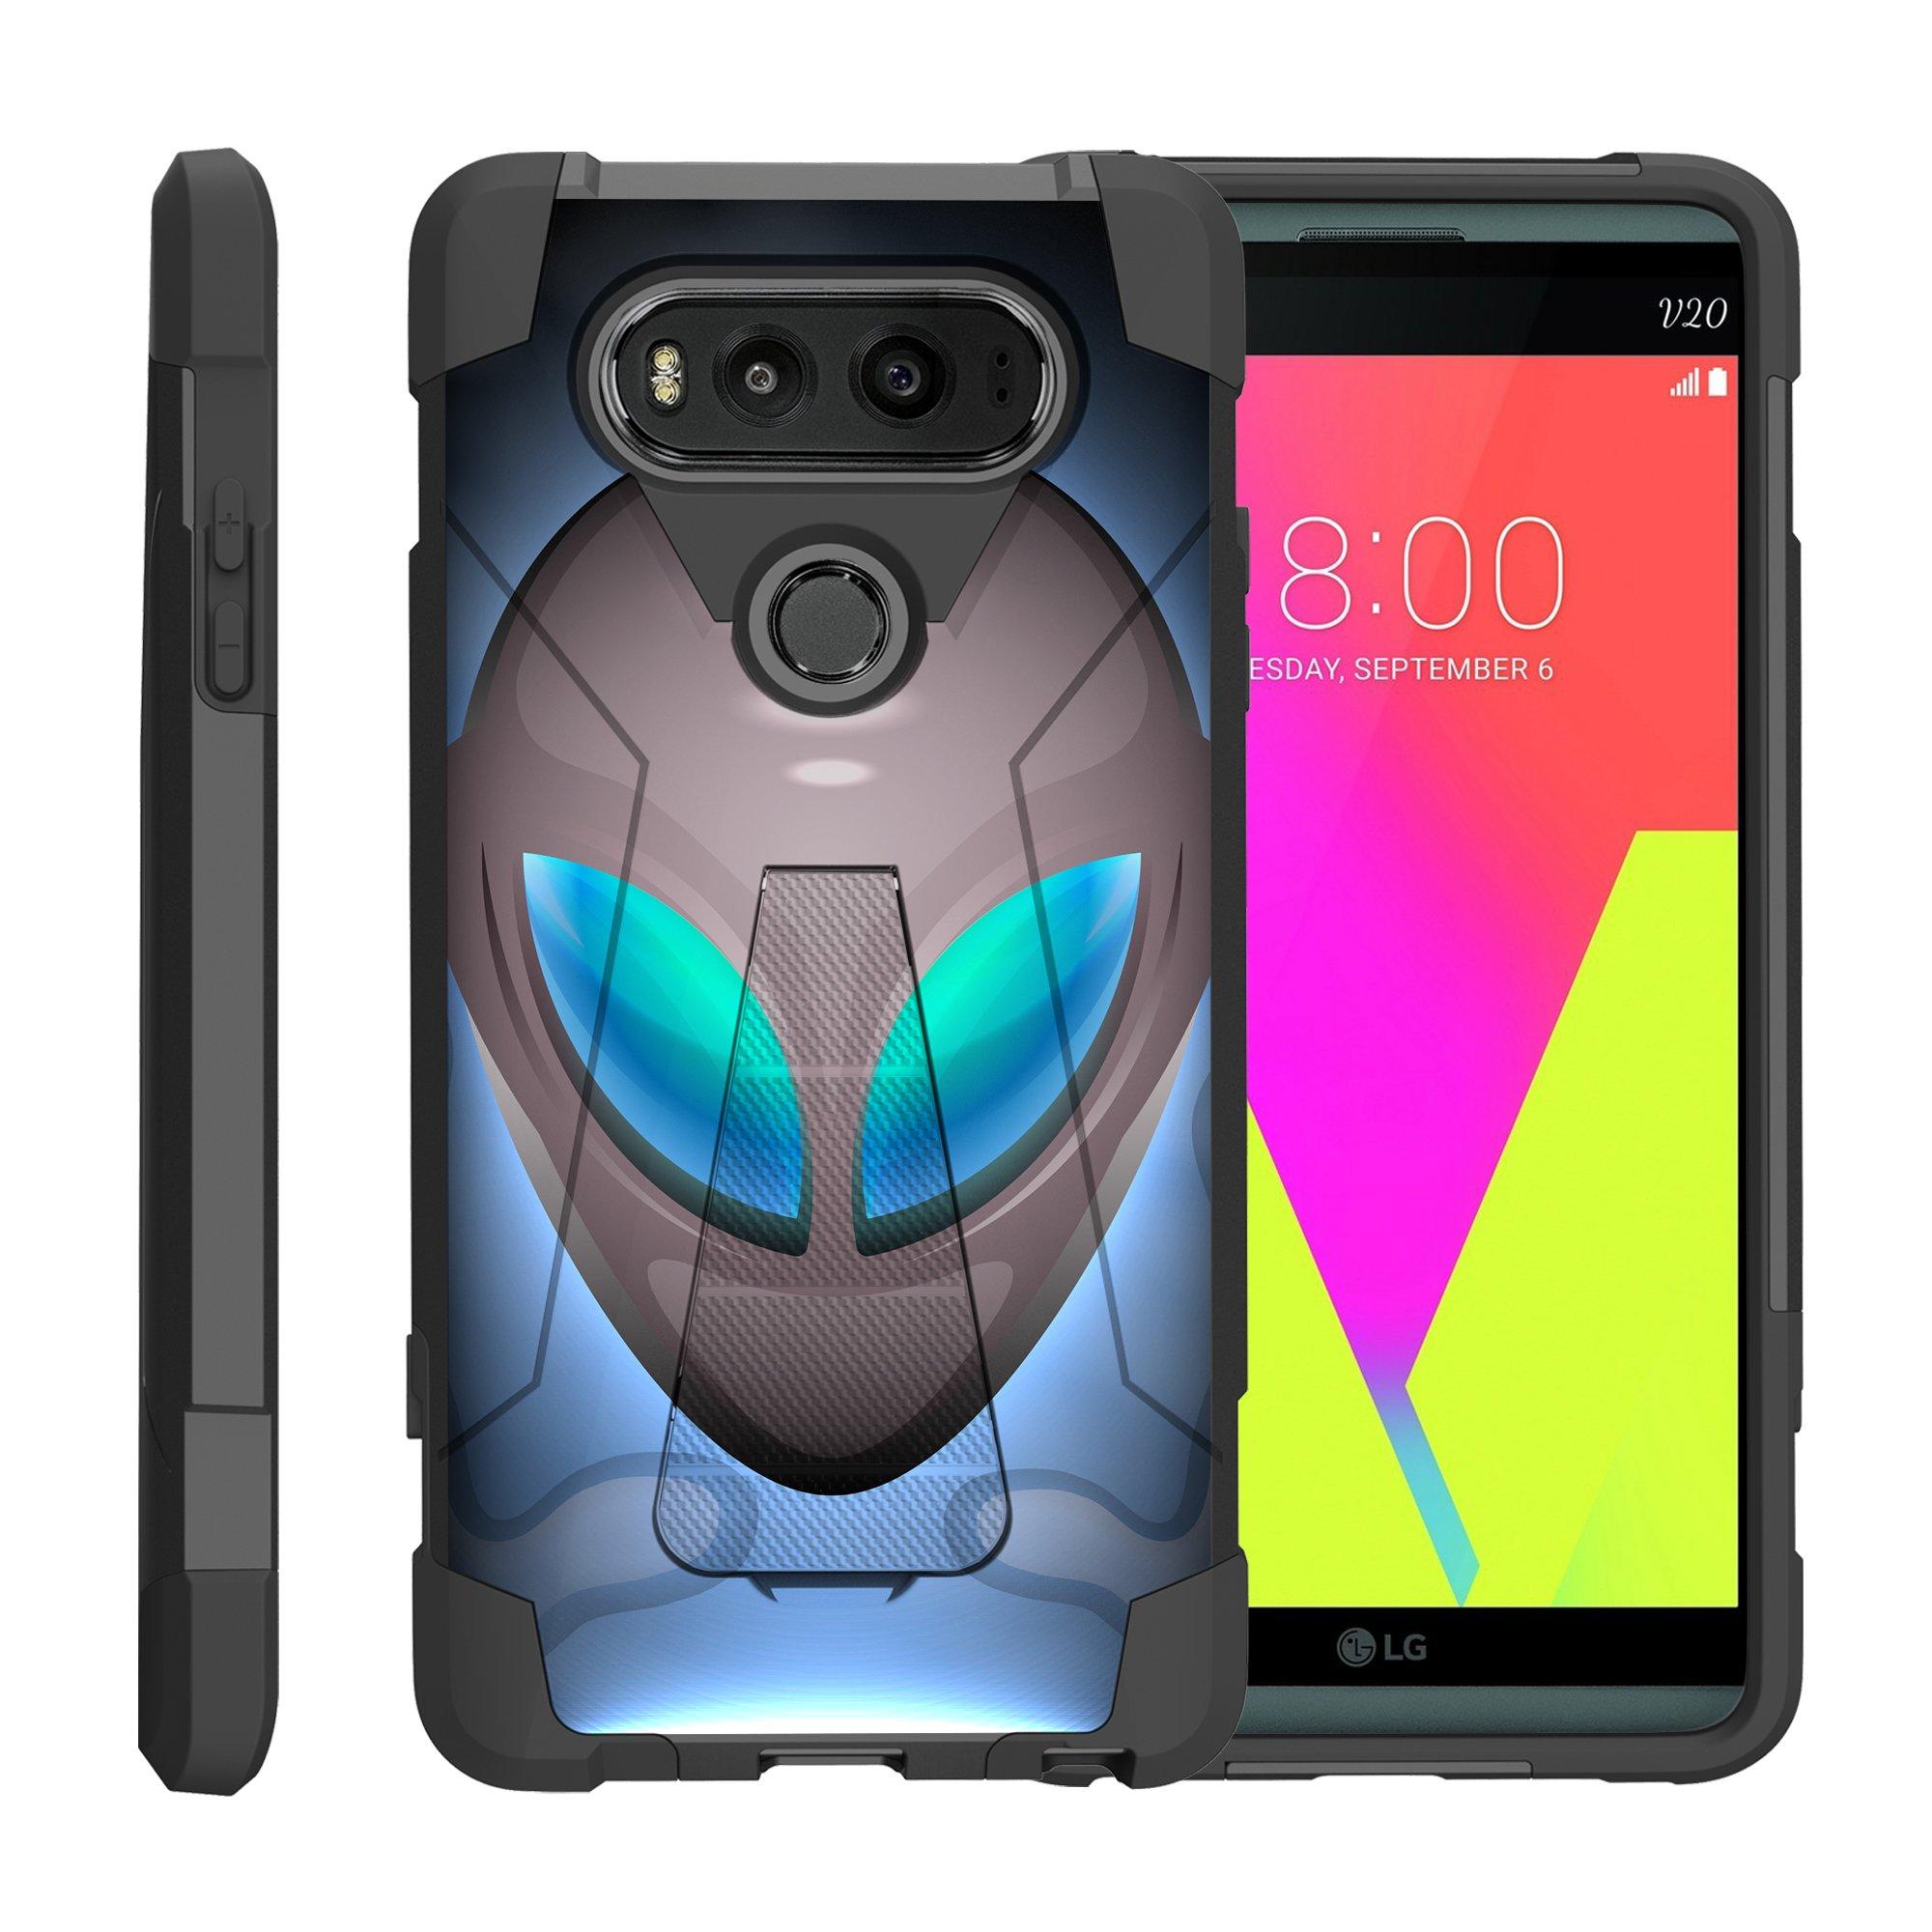 TurtleArmor ® | For LG V20 VS995, H990, LS997 [Dynamic Shell] Dual Layer Hybrid Silicone Hard Shell Kickstand Case - Alien Mind Warp